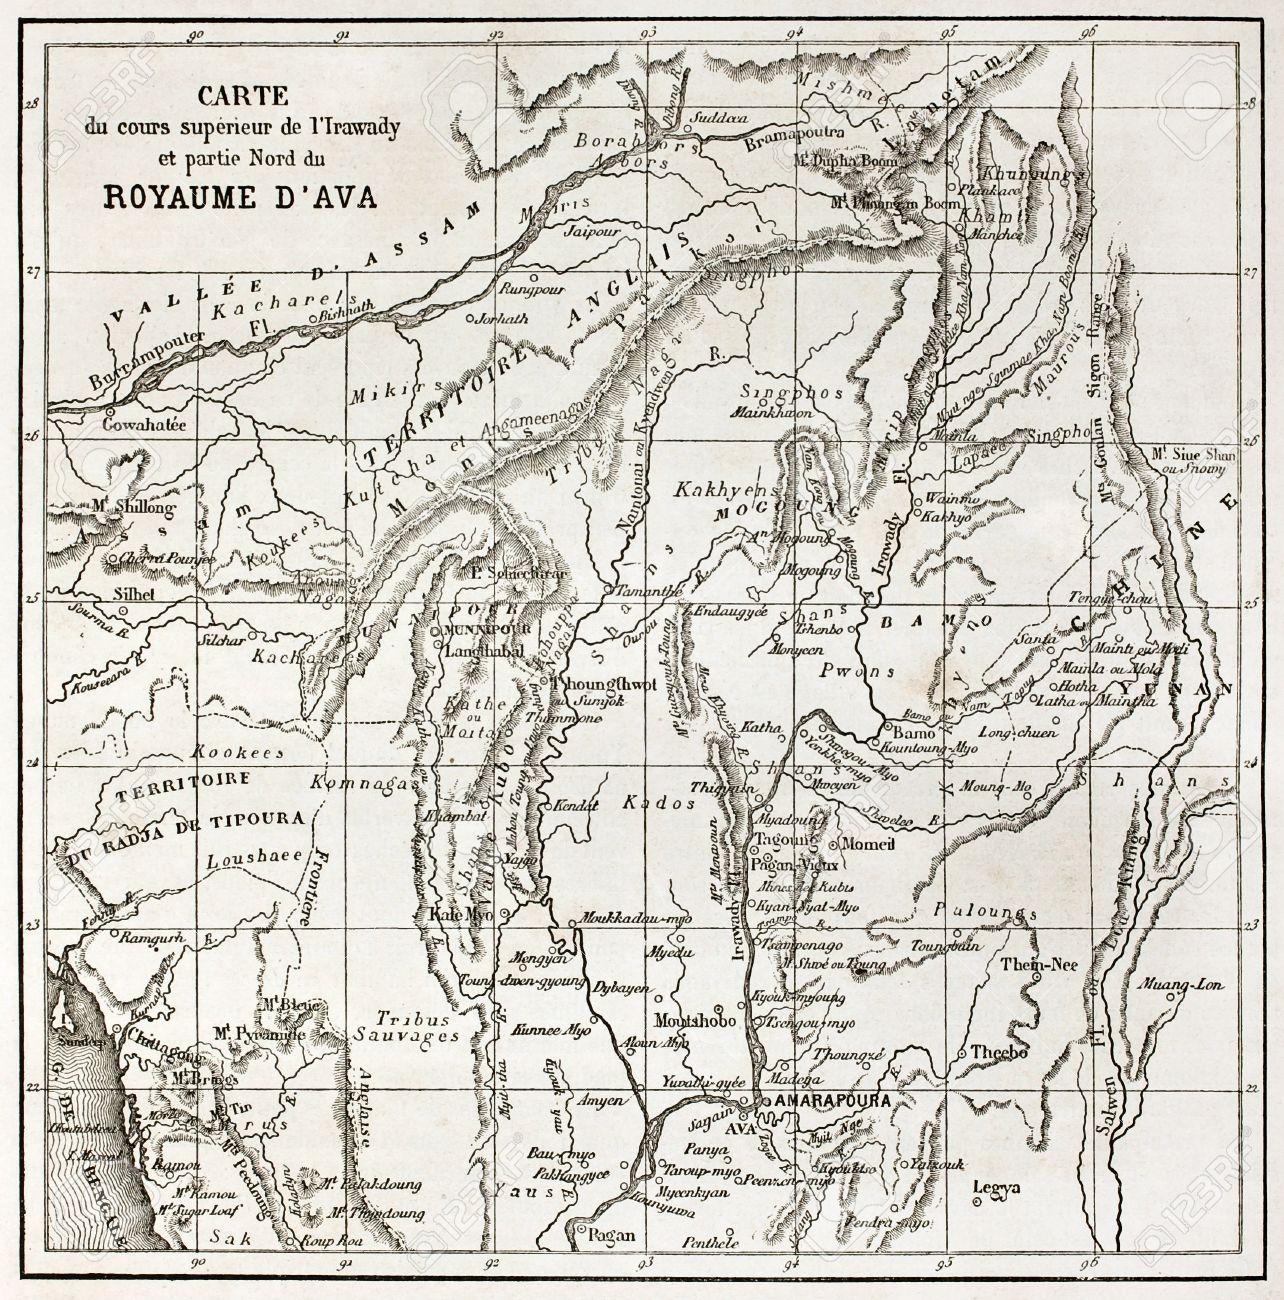 Irrawaddy river northern course old map (Ava Kingdom). Created.. on shwedagon paya, salween river map, andaman sea, amazon river map, ob river, yellow river map, mandalay palace, indus river map, amu darya, inle lake, west river map, chang river map, rhine river map, salween river, yangtze river, red river on map, mali river, amur river map, euphrates river map, kachin state, irrawaddy delta, hong river map, lancang river map, yellow river, mississippi river map, rakhine state, rhone river map, kuthodaw pagoda, vistula river map, ananda temple, niger river map, ob river map, tigris river map, yenisei river, irrawaddy dolphin, chindwin river, brahmaputra river map,